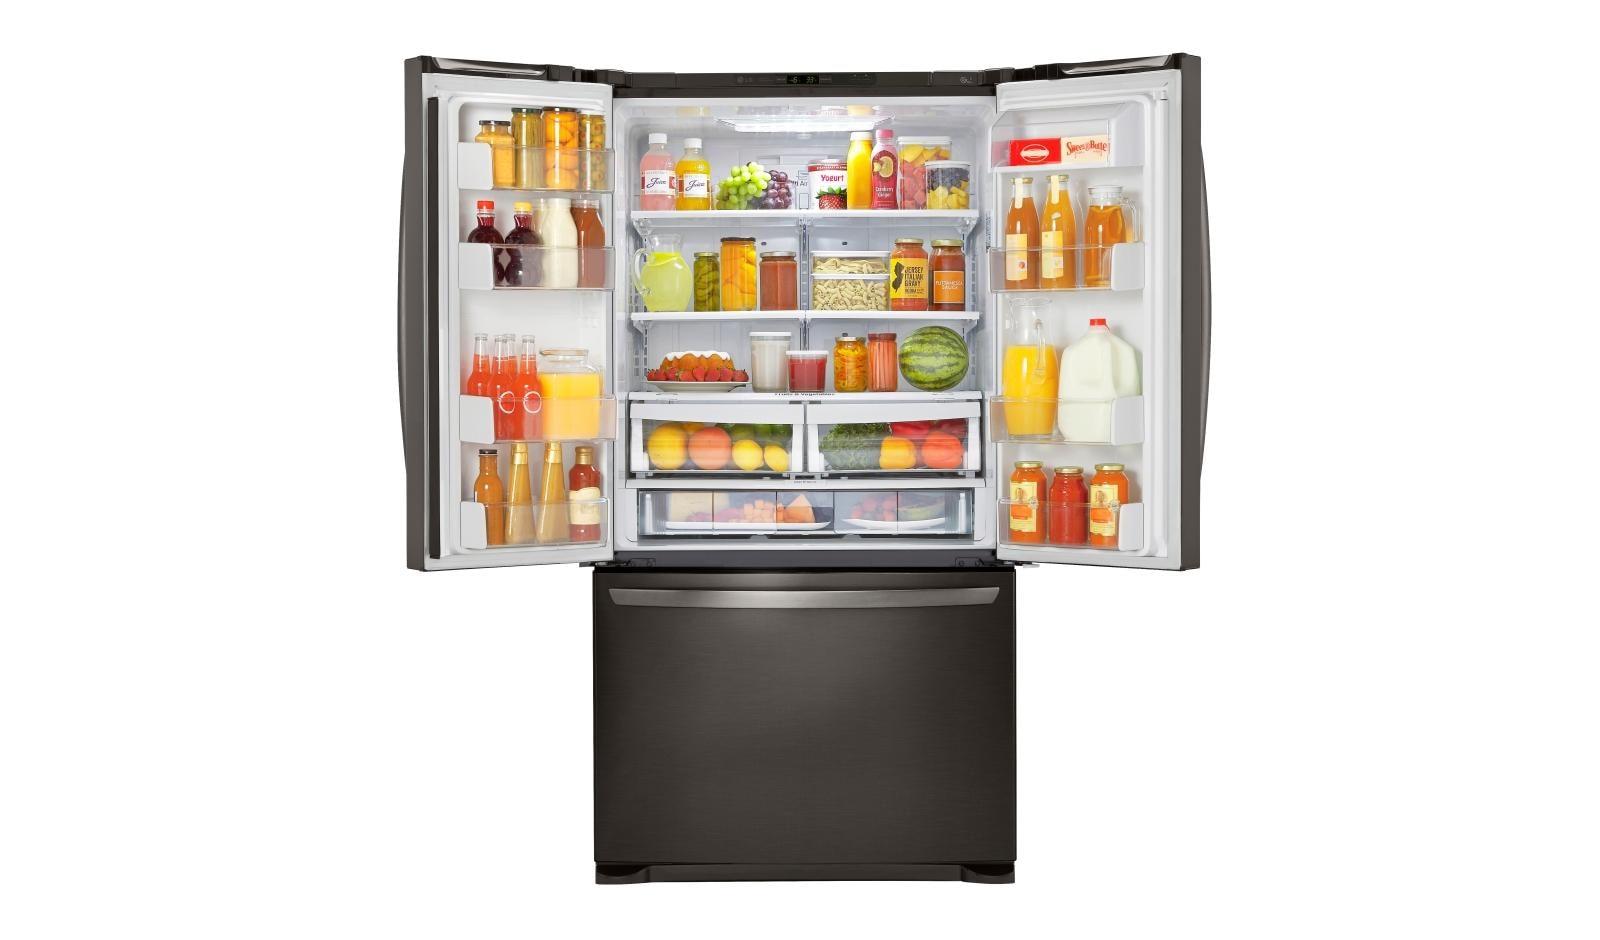 LG LFCS25426D: Mega Capacity 3-Door French Door Refrigerator | LG USA